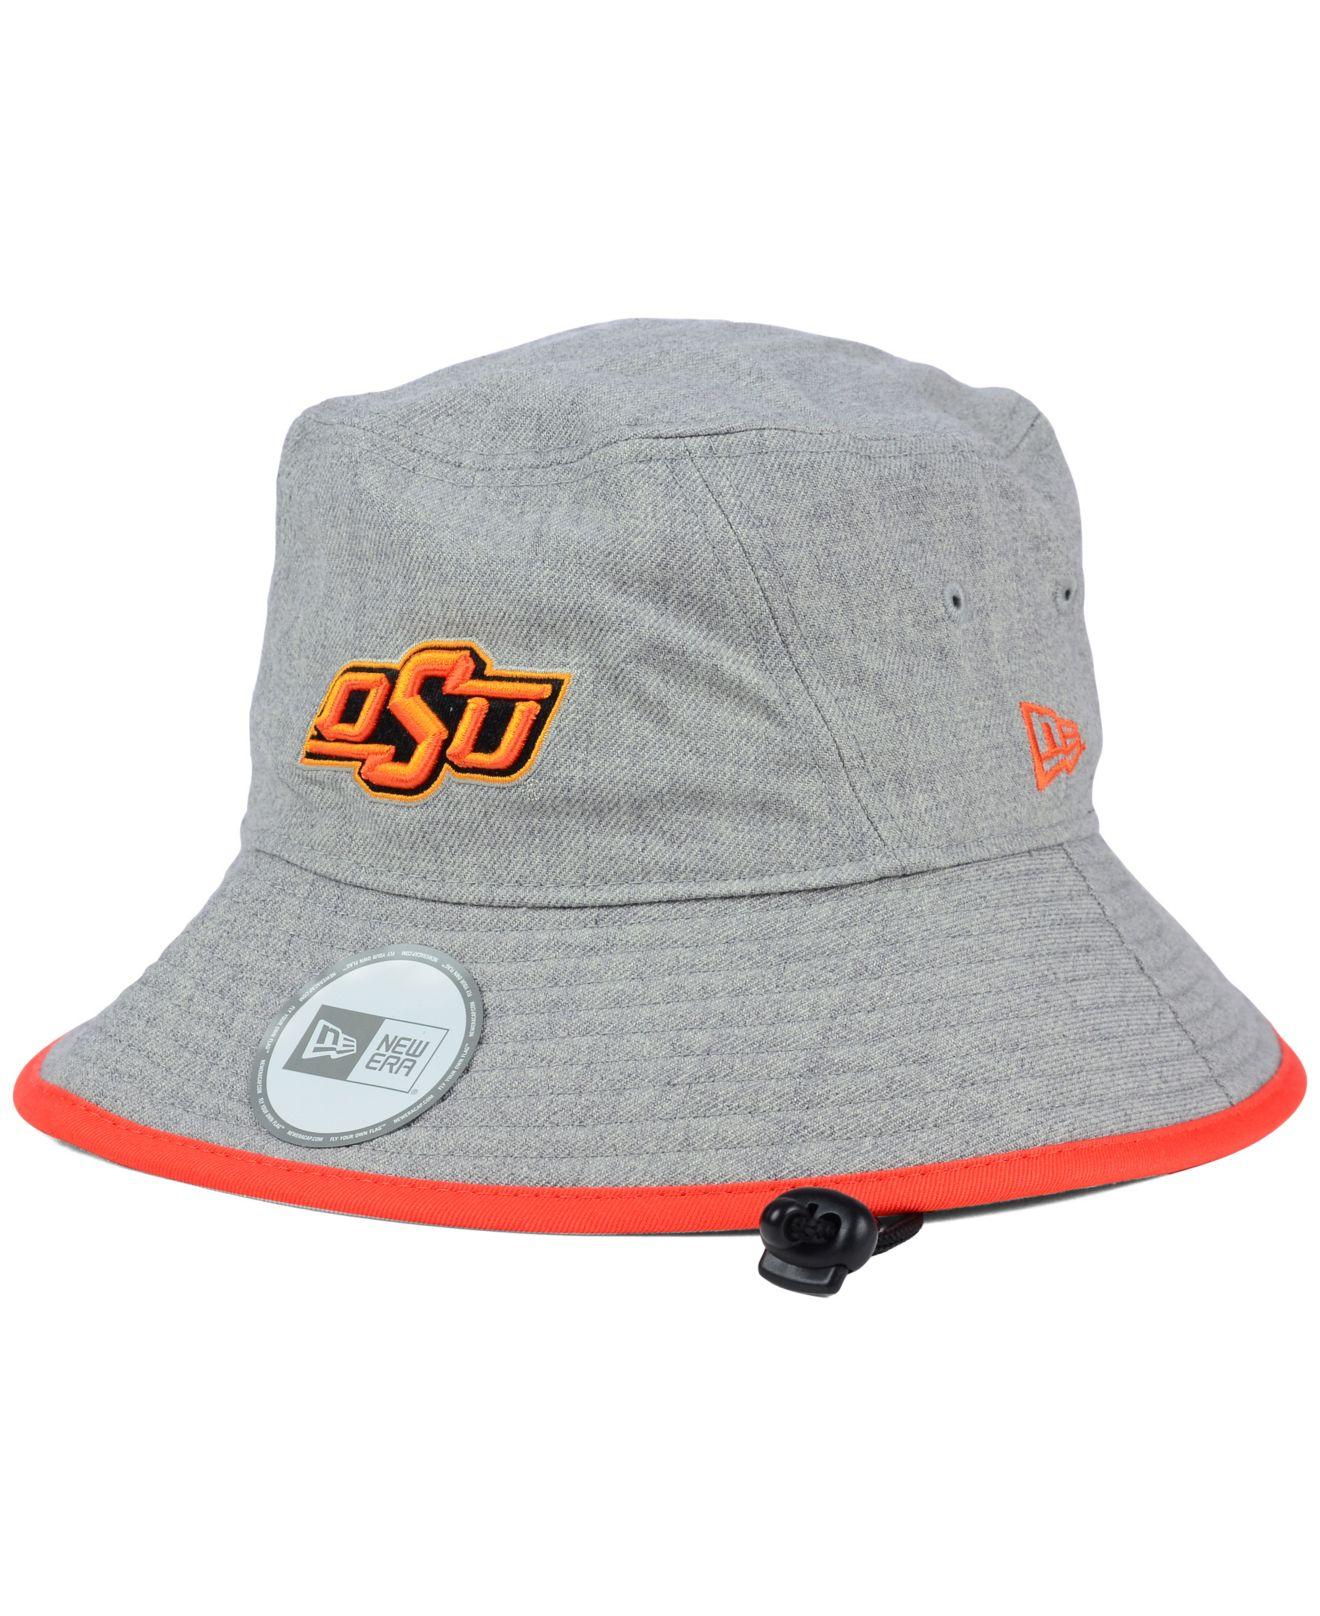 Lyst - KTZ Oklahoma State Cowboys Tip Bucket Hat in Gray 18231d5cb88b